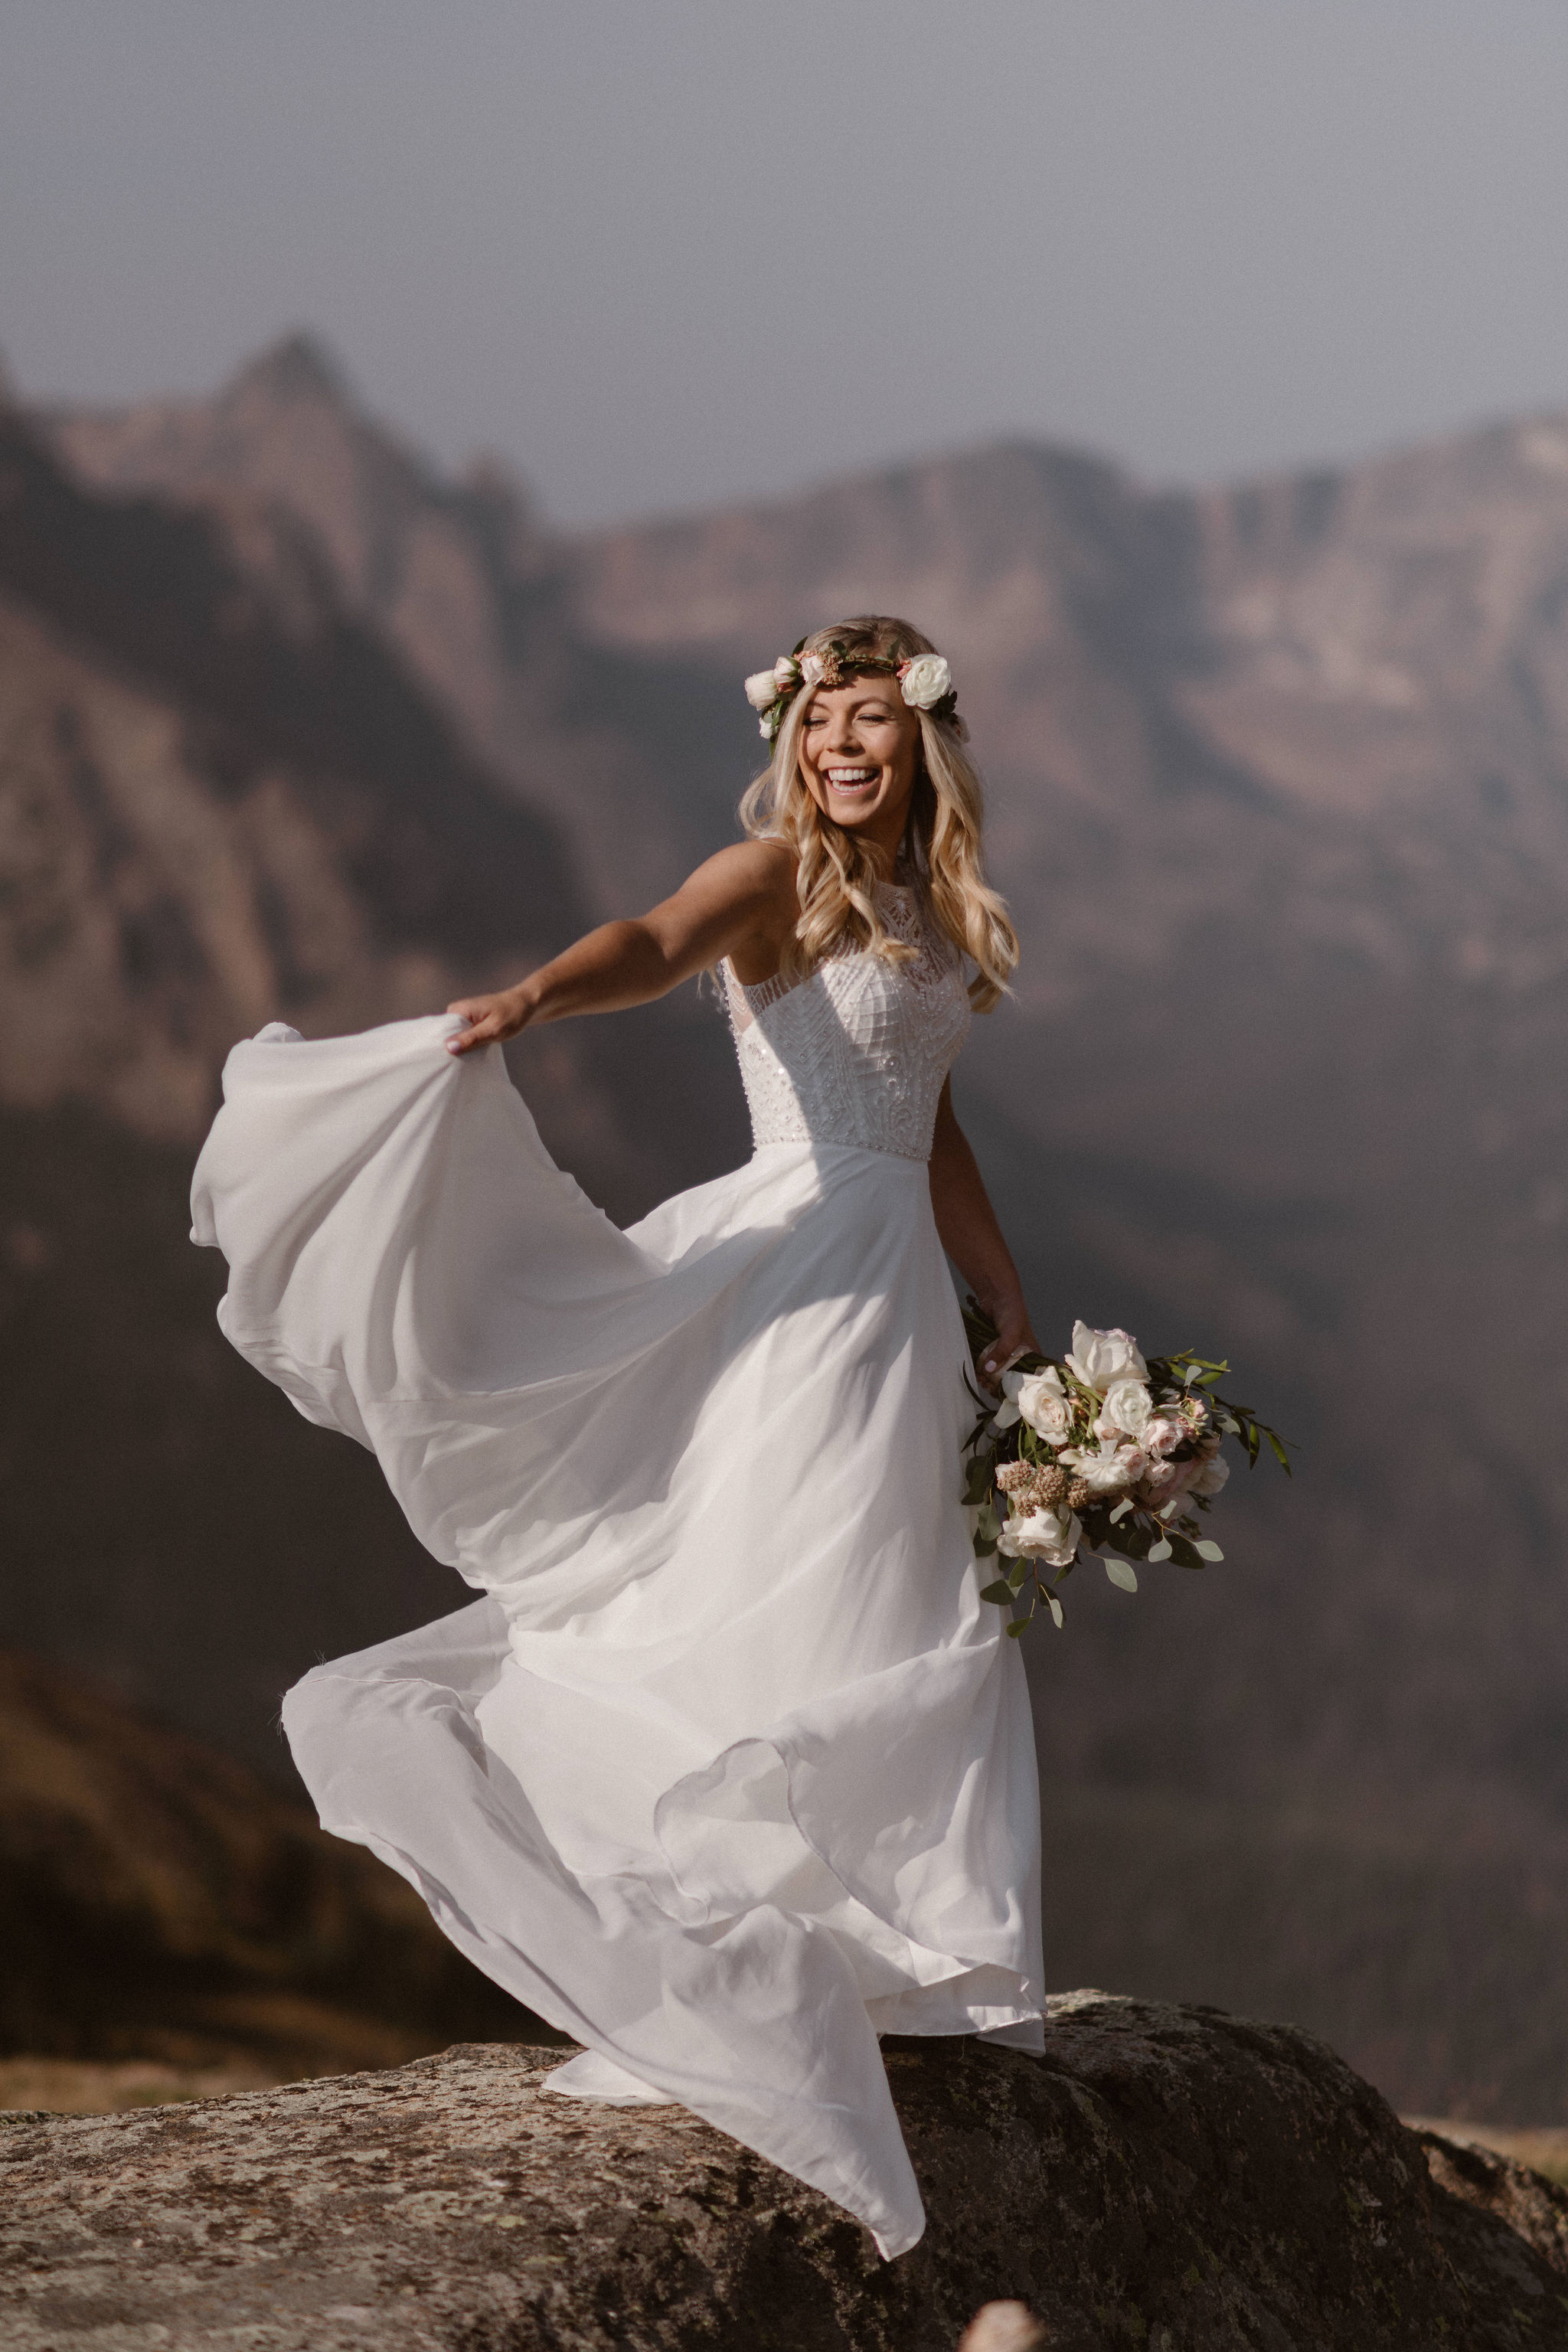 Flowers by Lace and Lilies, bridal bouquet, wedding bouquet, elopement, colorado wedding, colorado elopement, hair flowers, flower crown